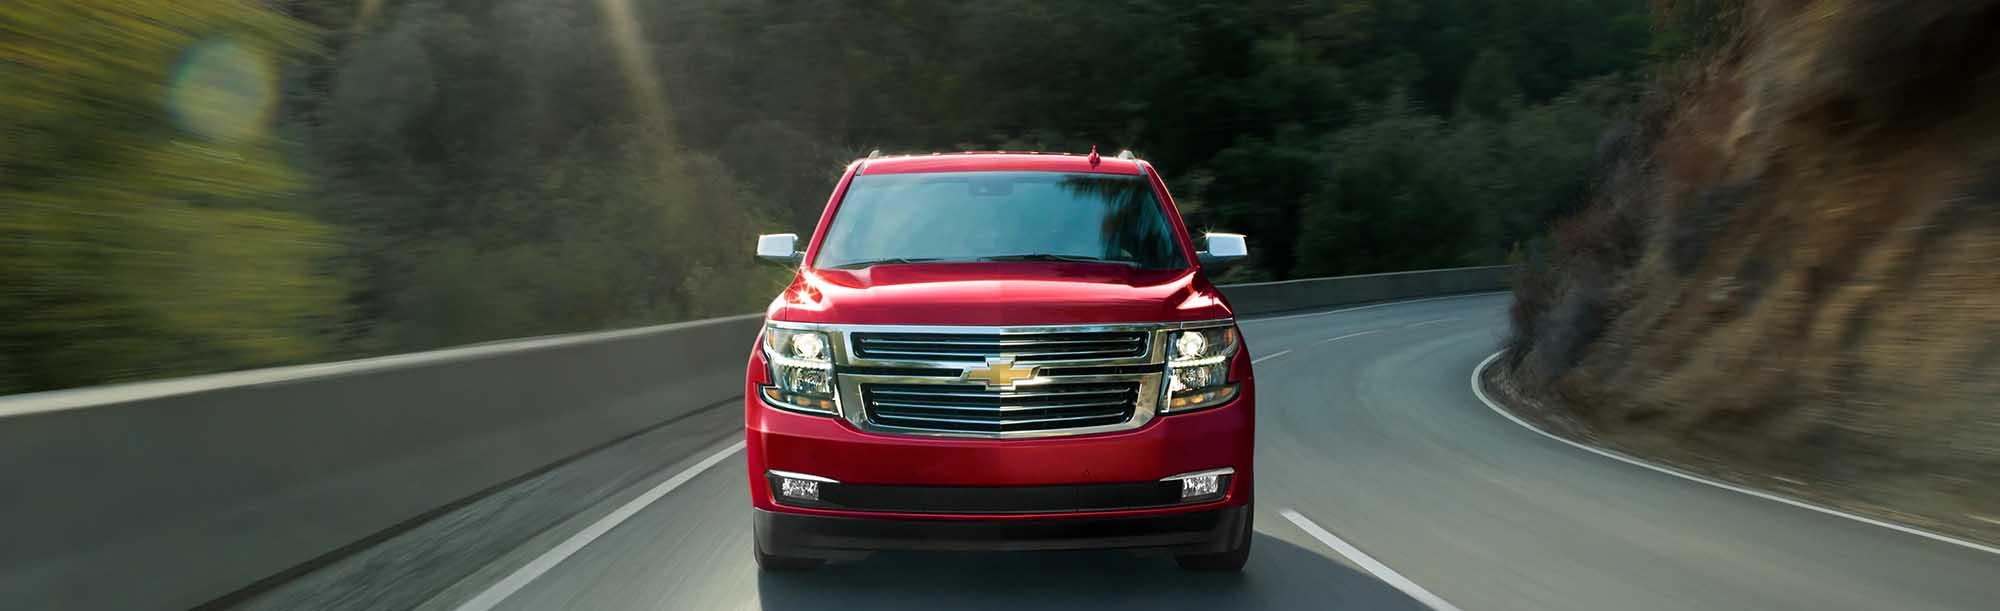 2020 Chevrolet Tahoe SUV On Road